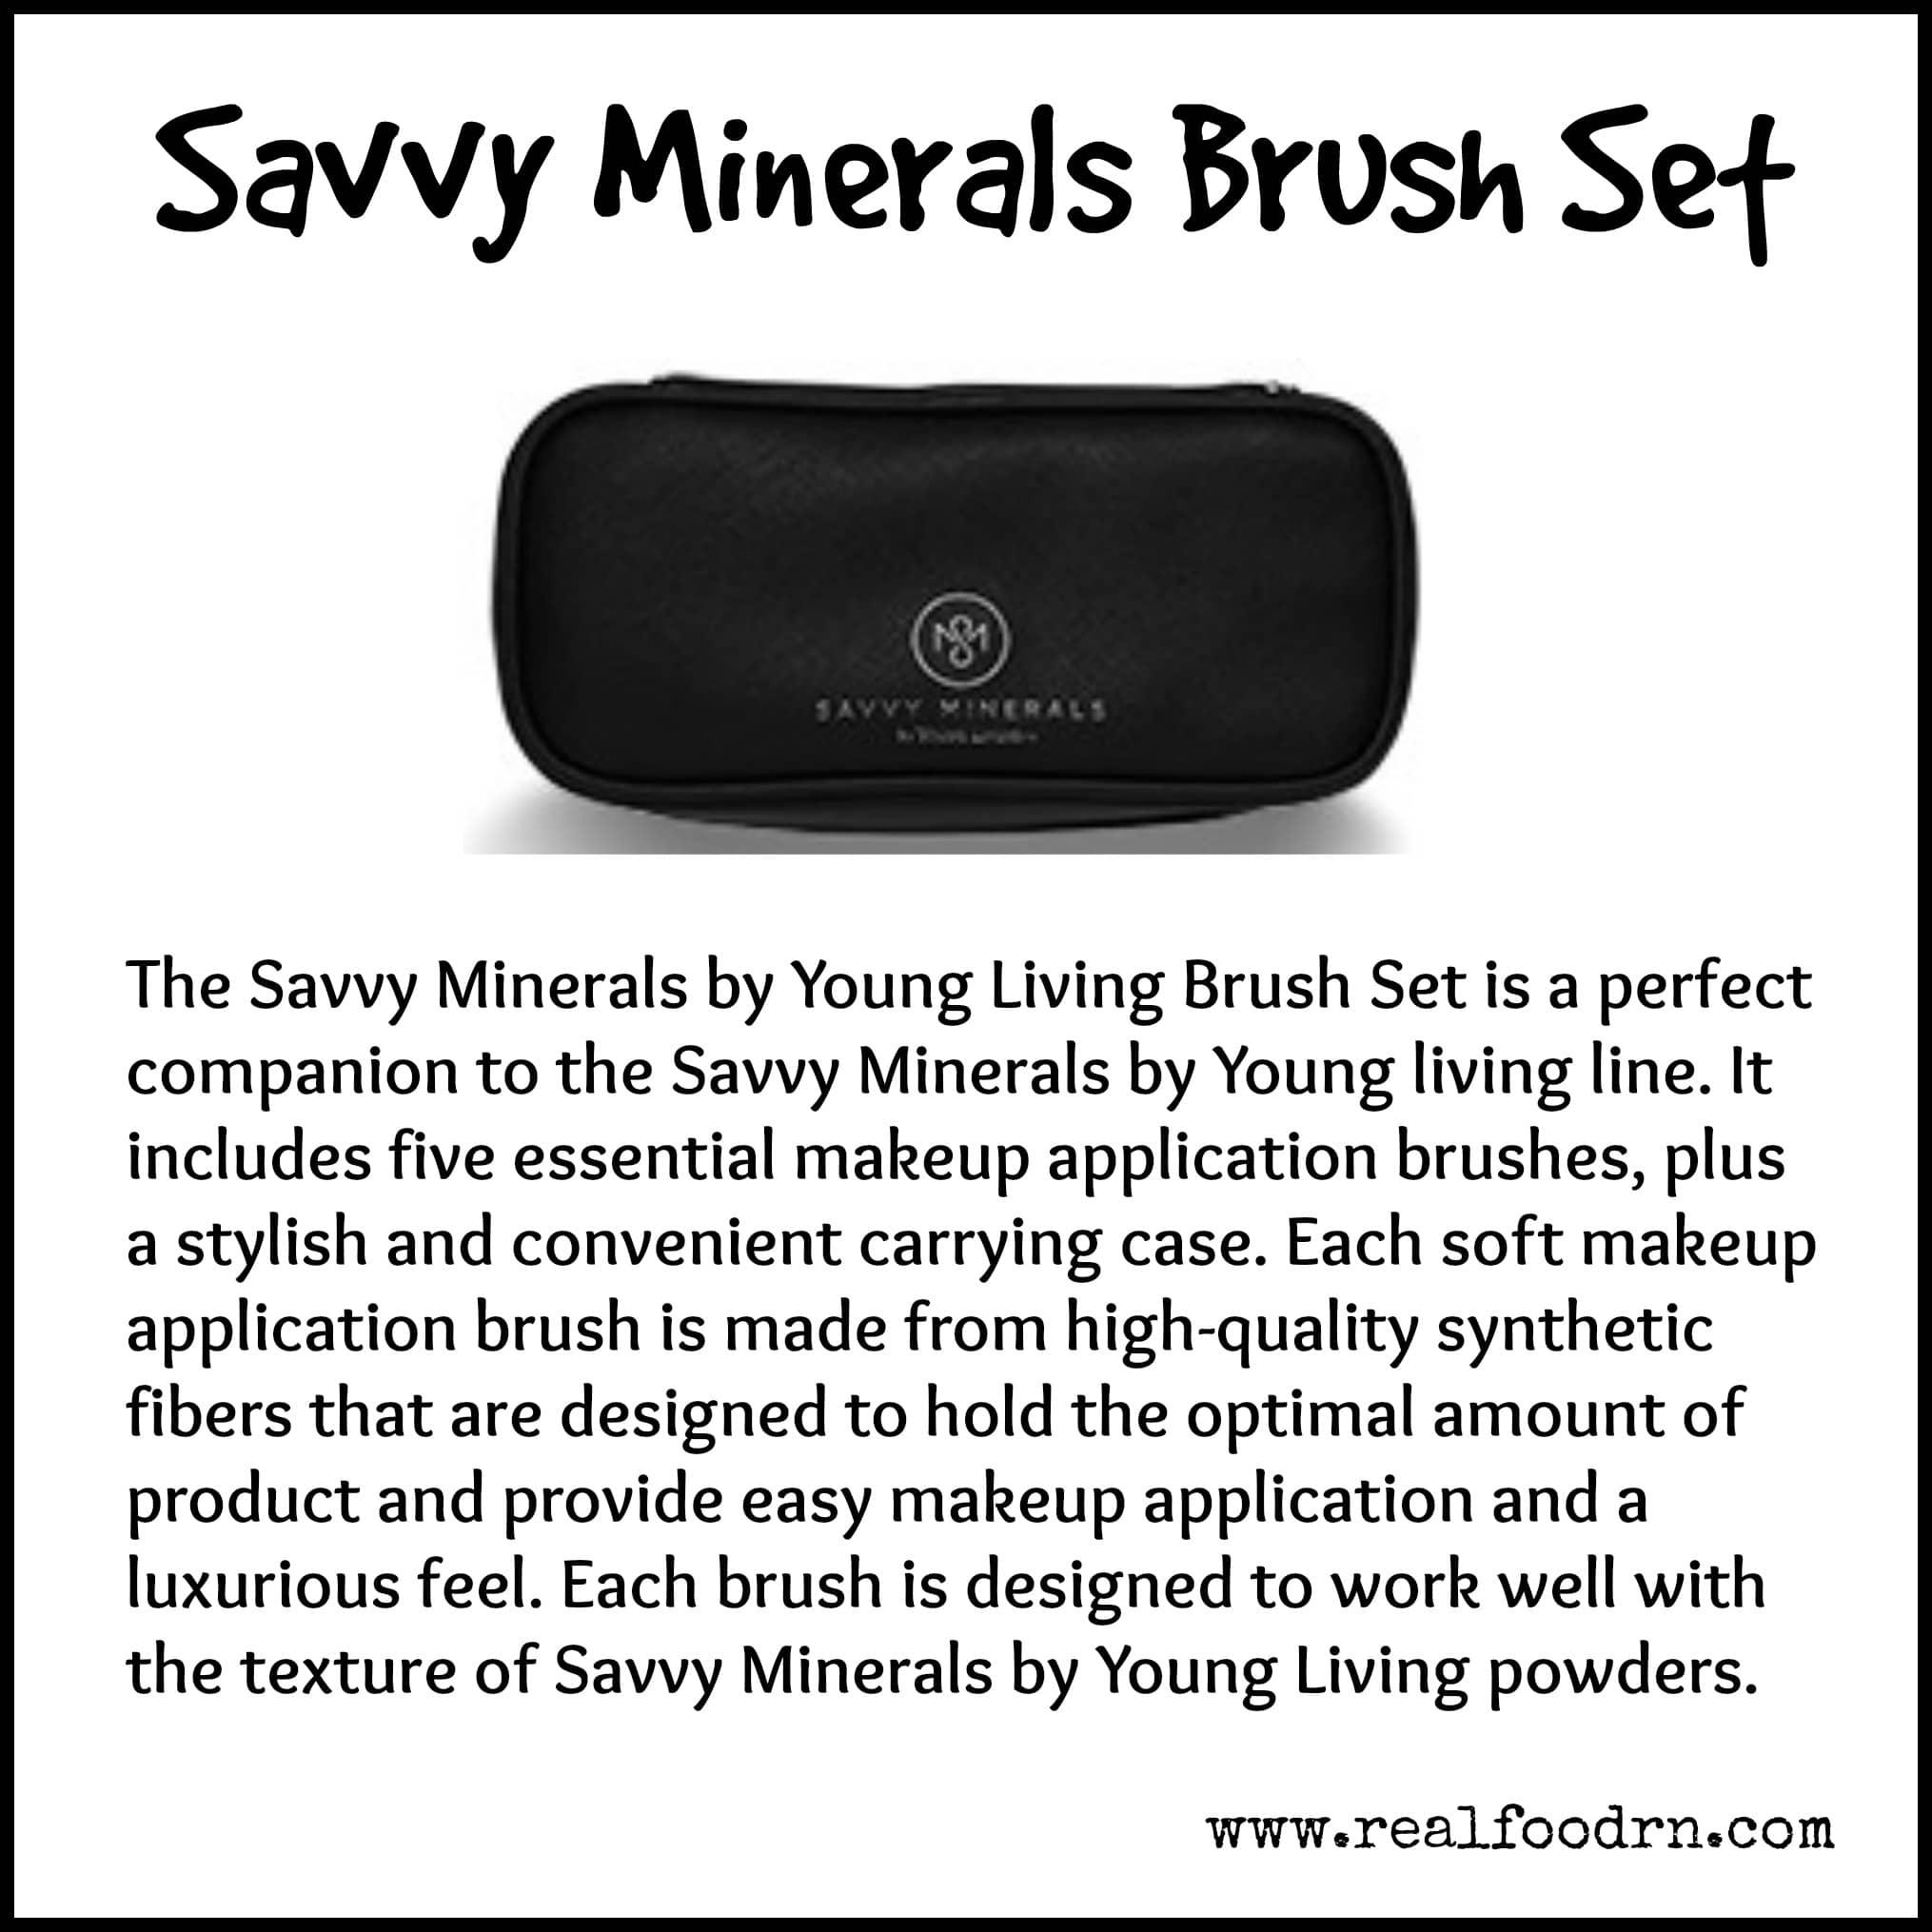 Savvy Minerals Brush Set